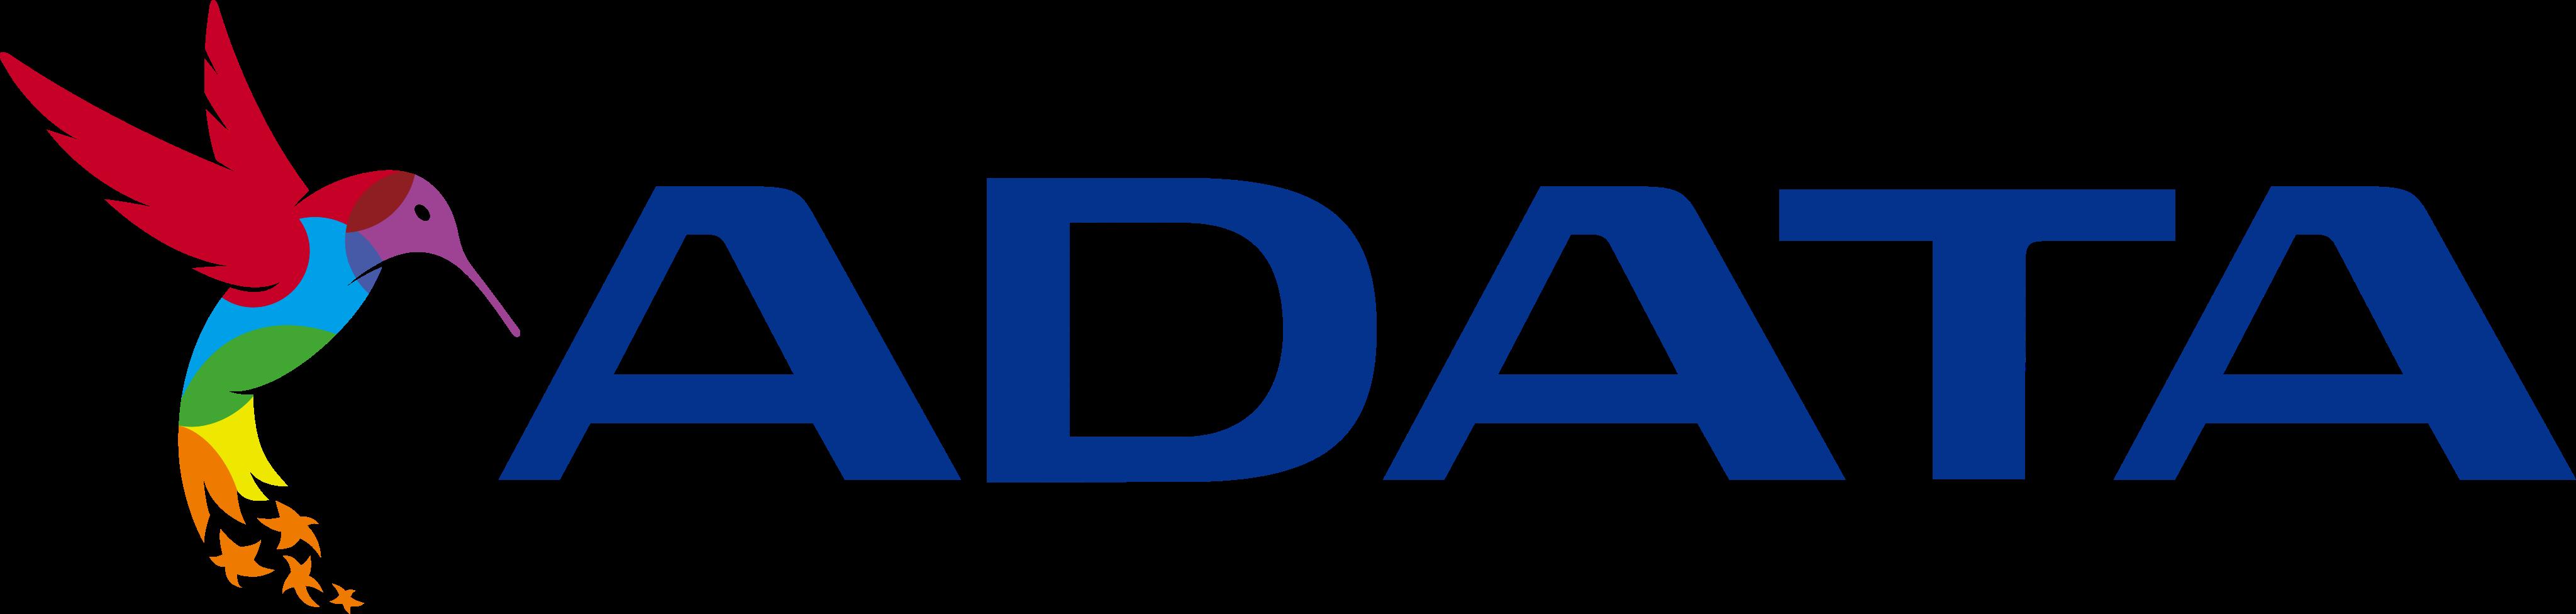 ADATA Logo - PNG and Vector - Logo Download